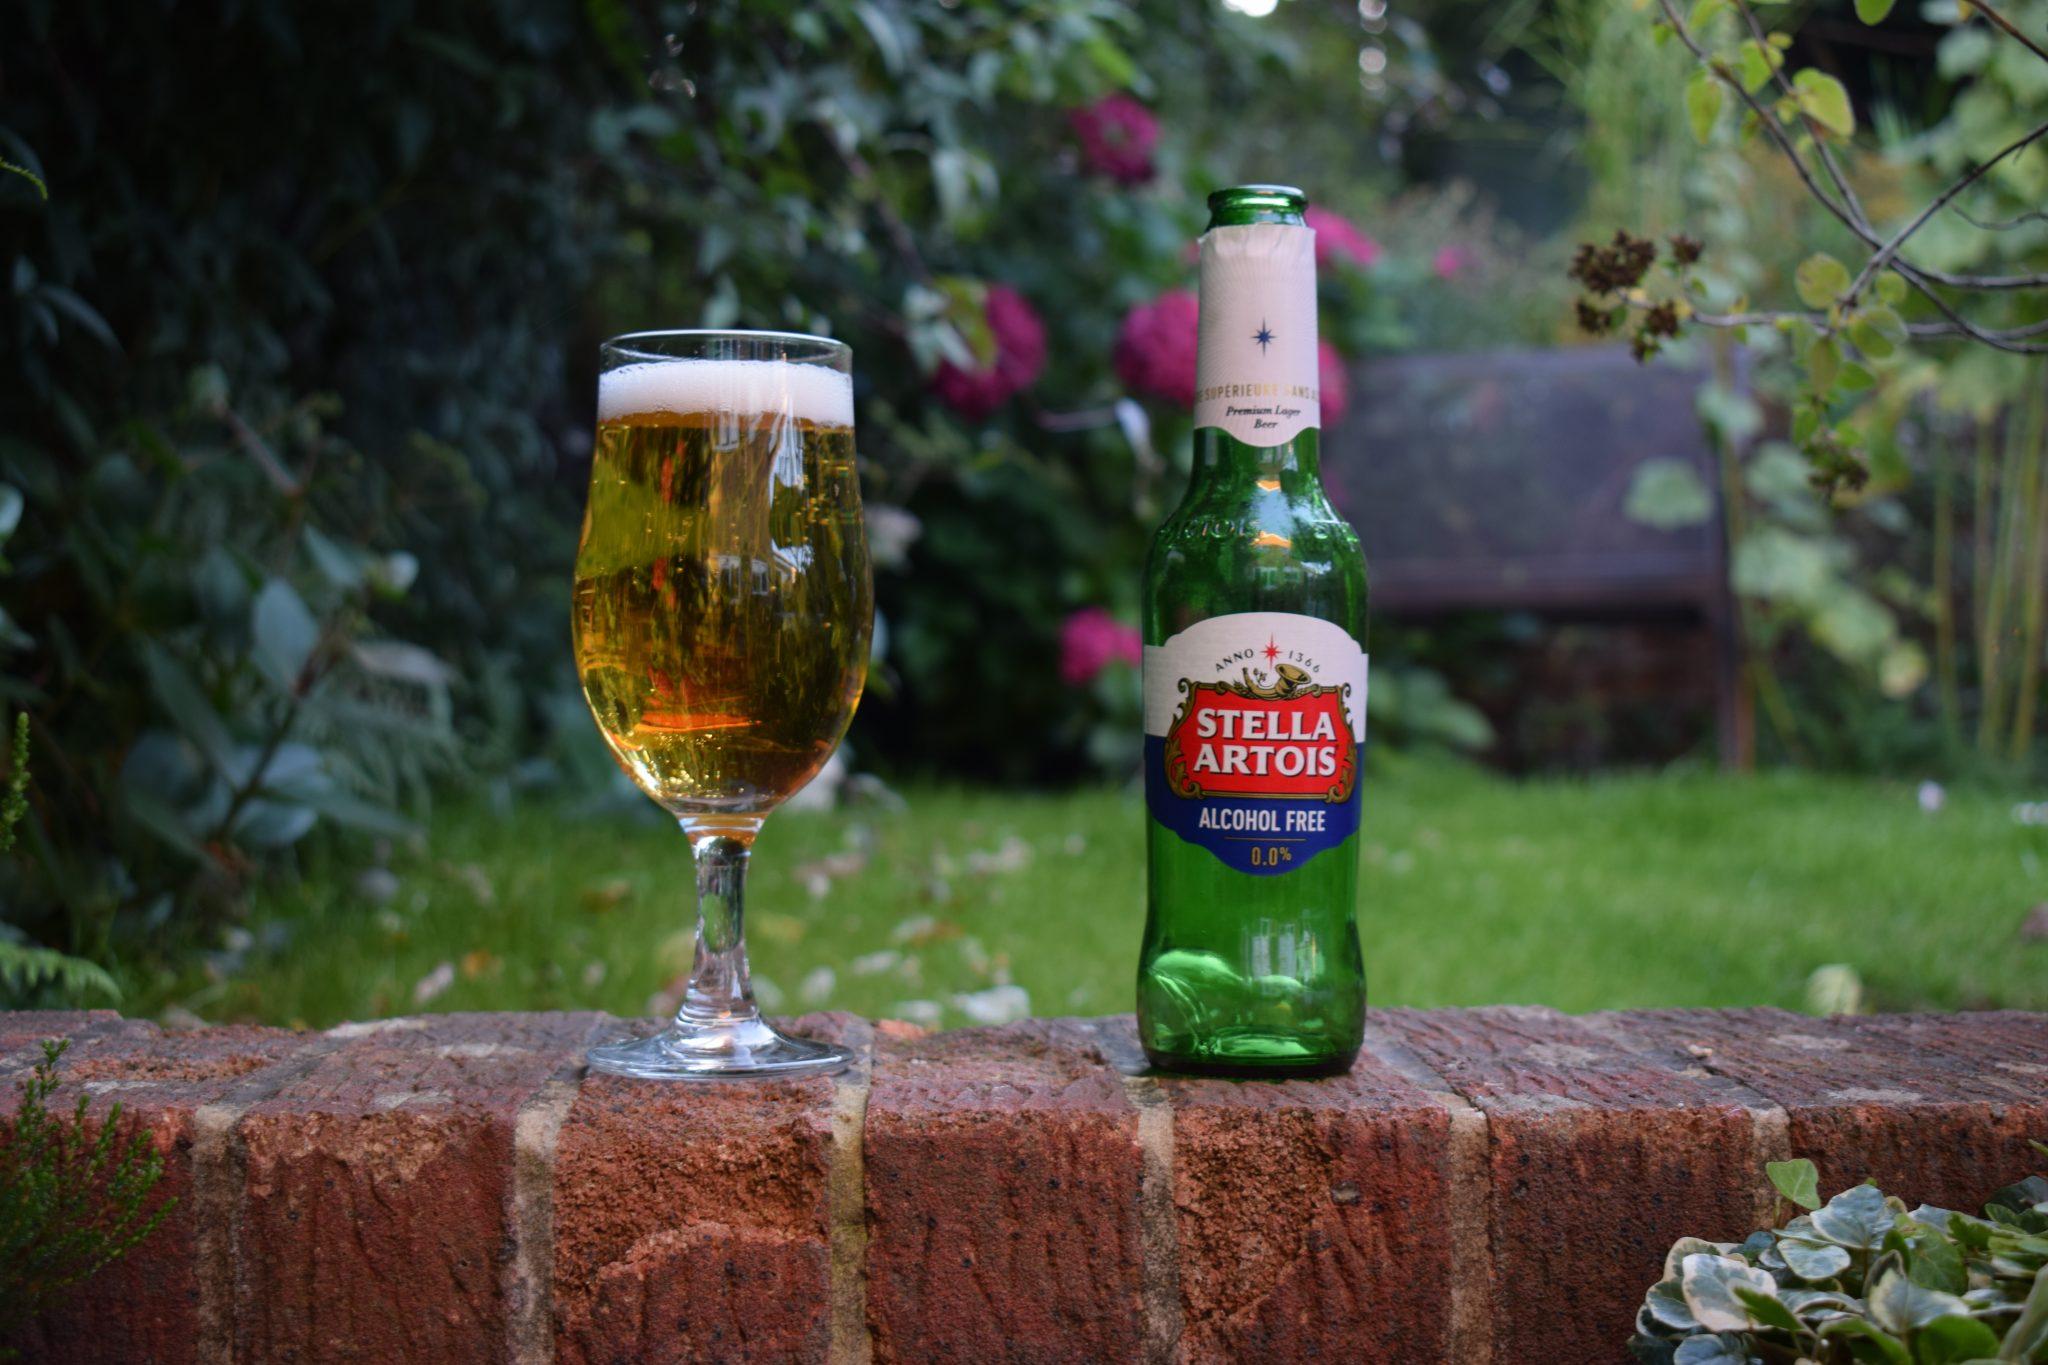 Stella Artois Alcohol Free (0%)